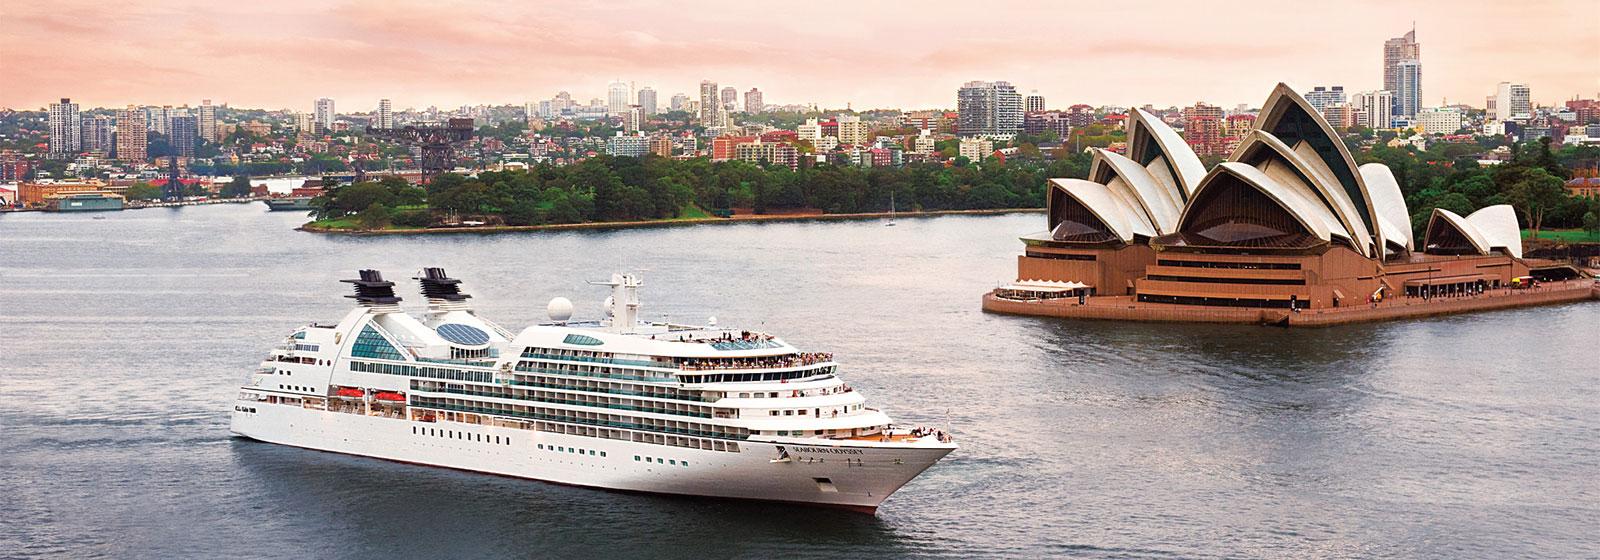 Seabourn Odyssey Sydney Harbour